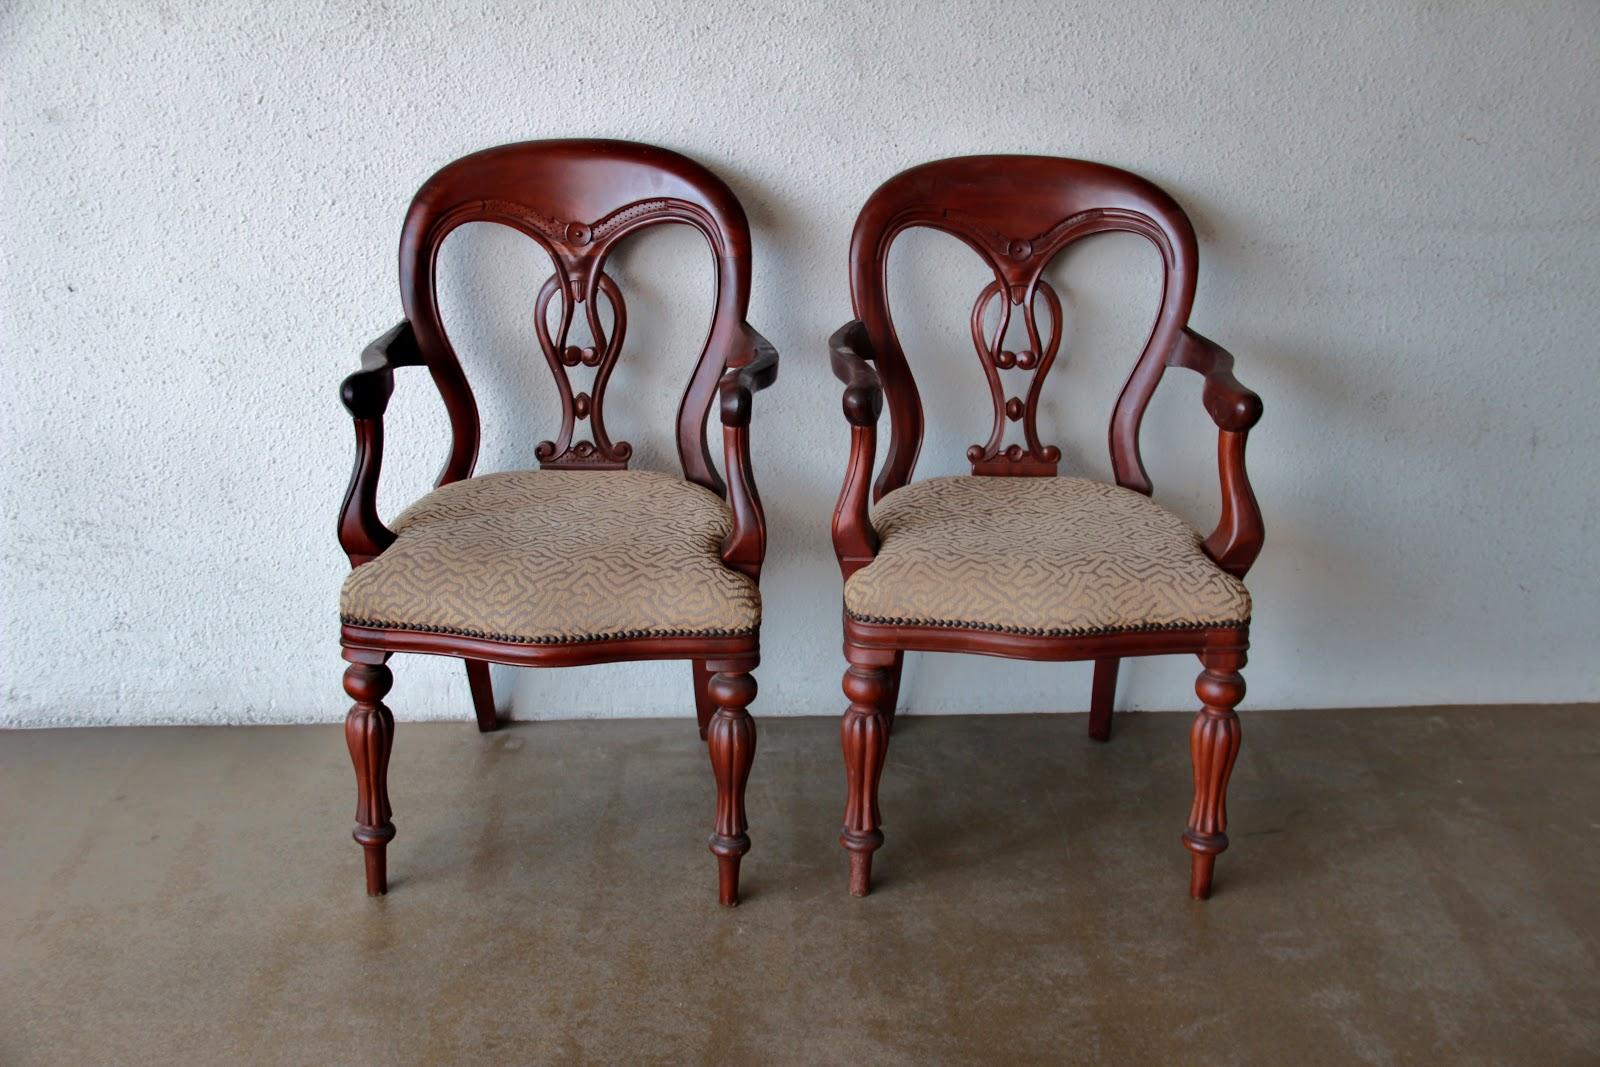 Craze for industrial furniture some vintage finds at second charm - The Current Craze For Industrial Furniture Some Vintage